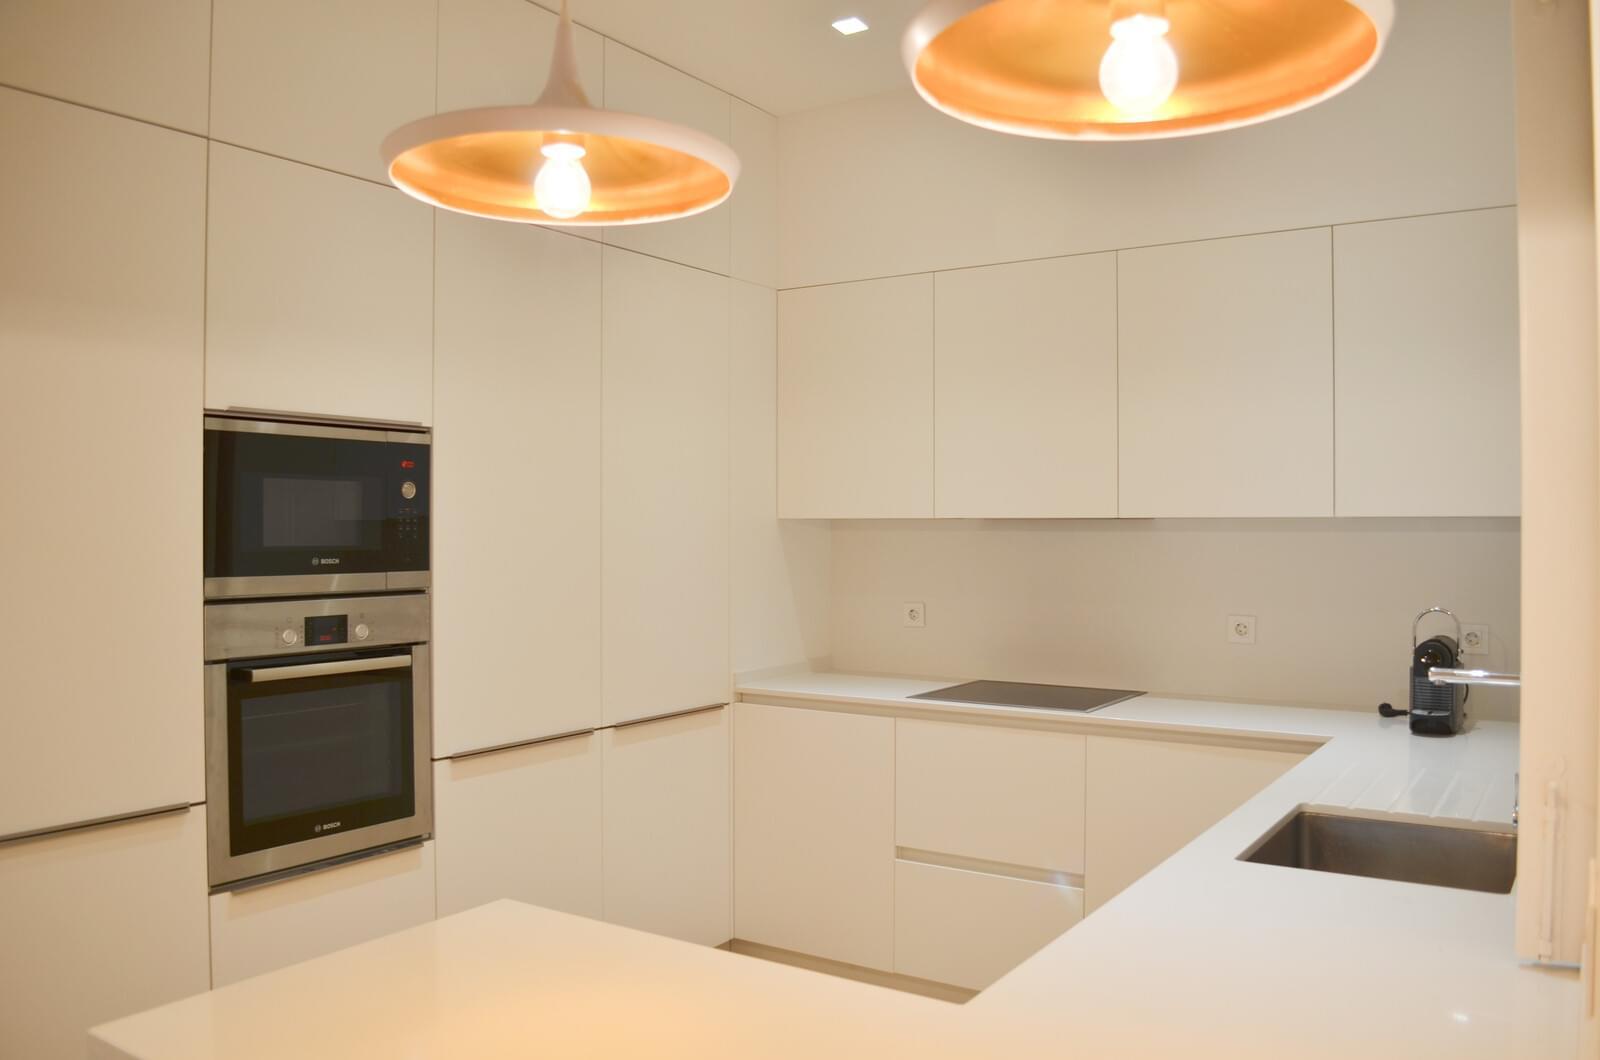 pf18801-apartamento-t2-lisboa-c4c5618c-73c8-4655-a62c-0146c602f993